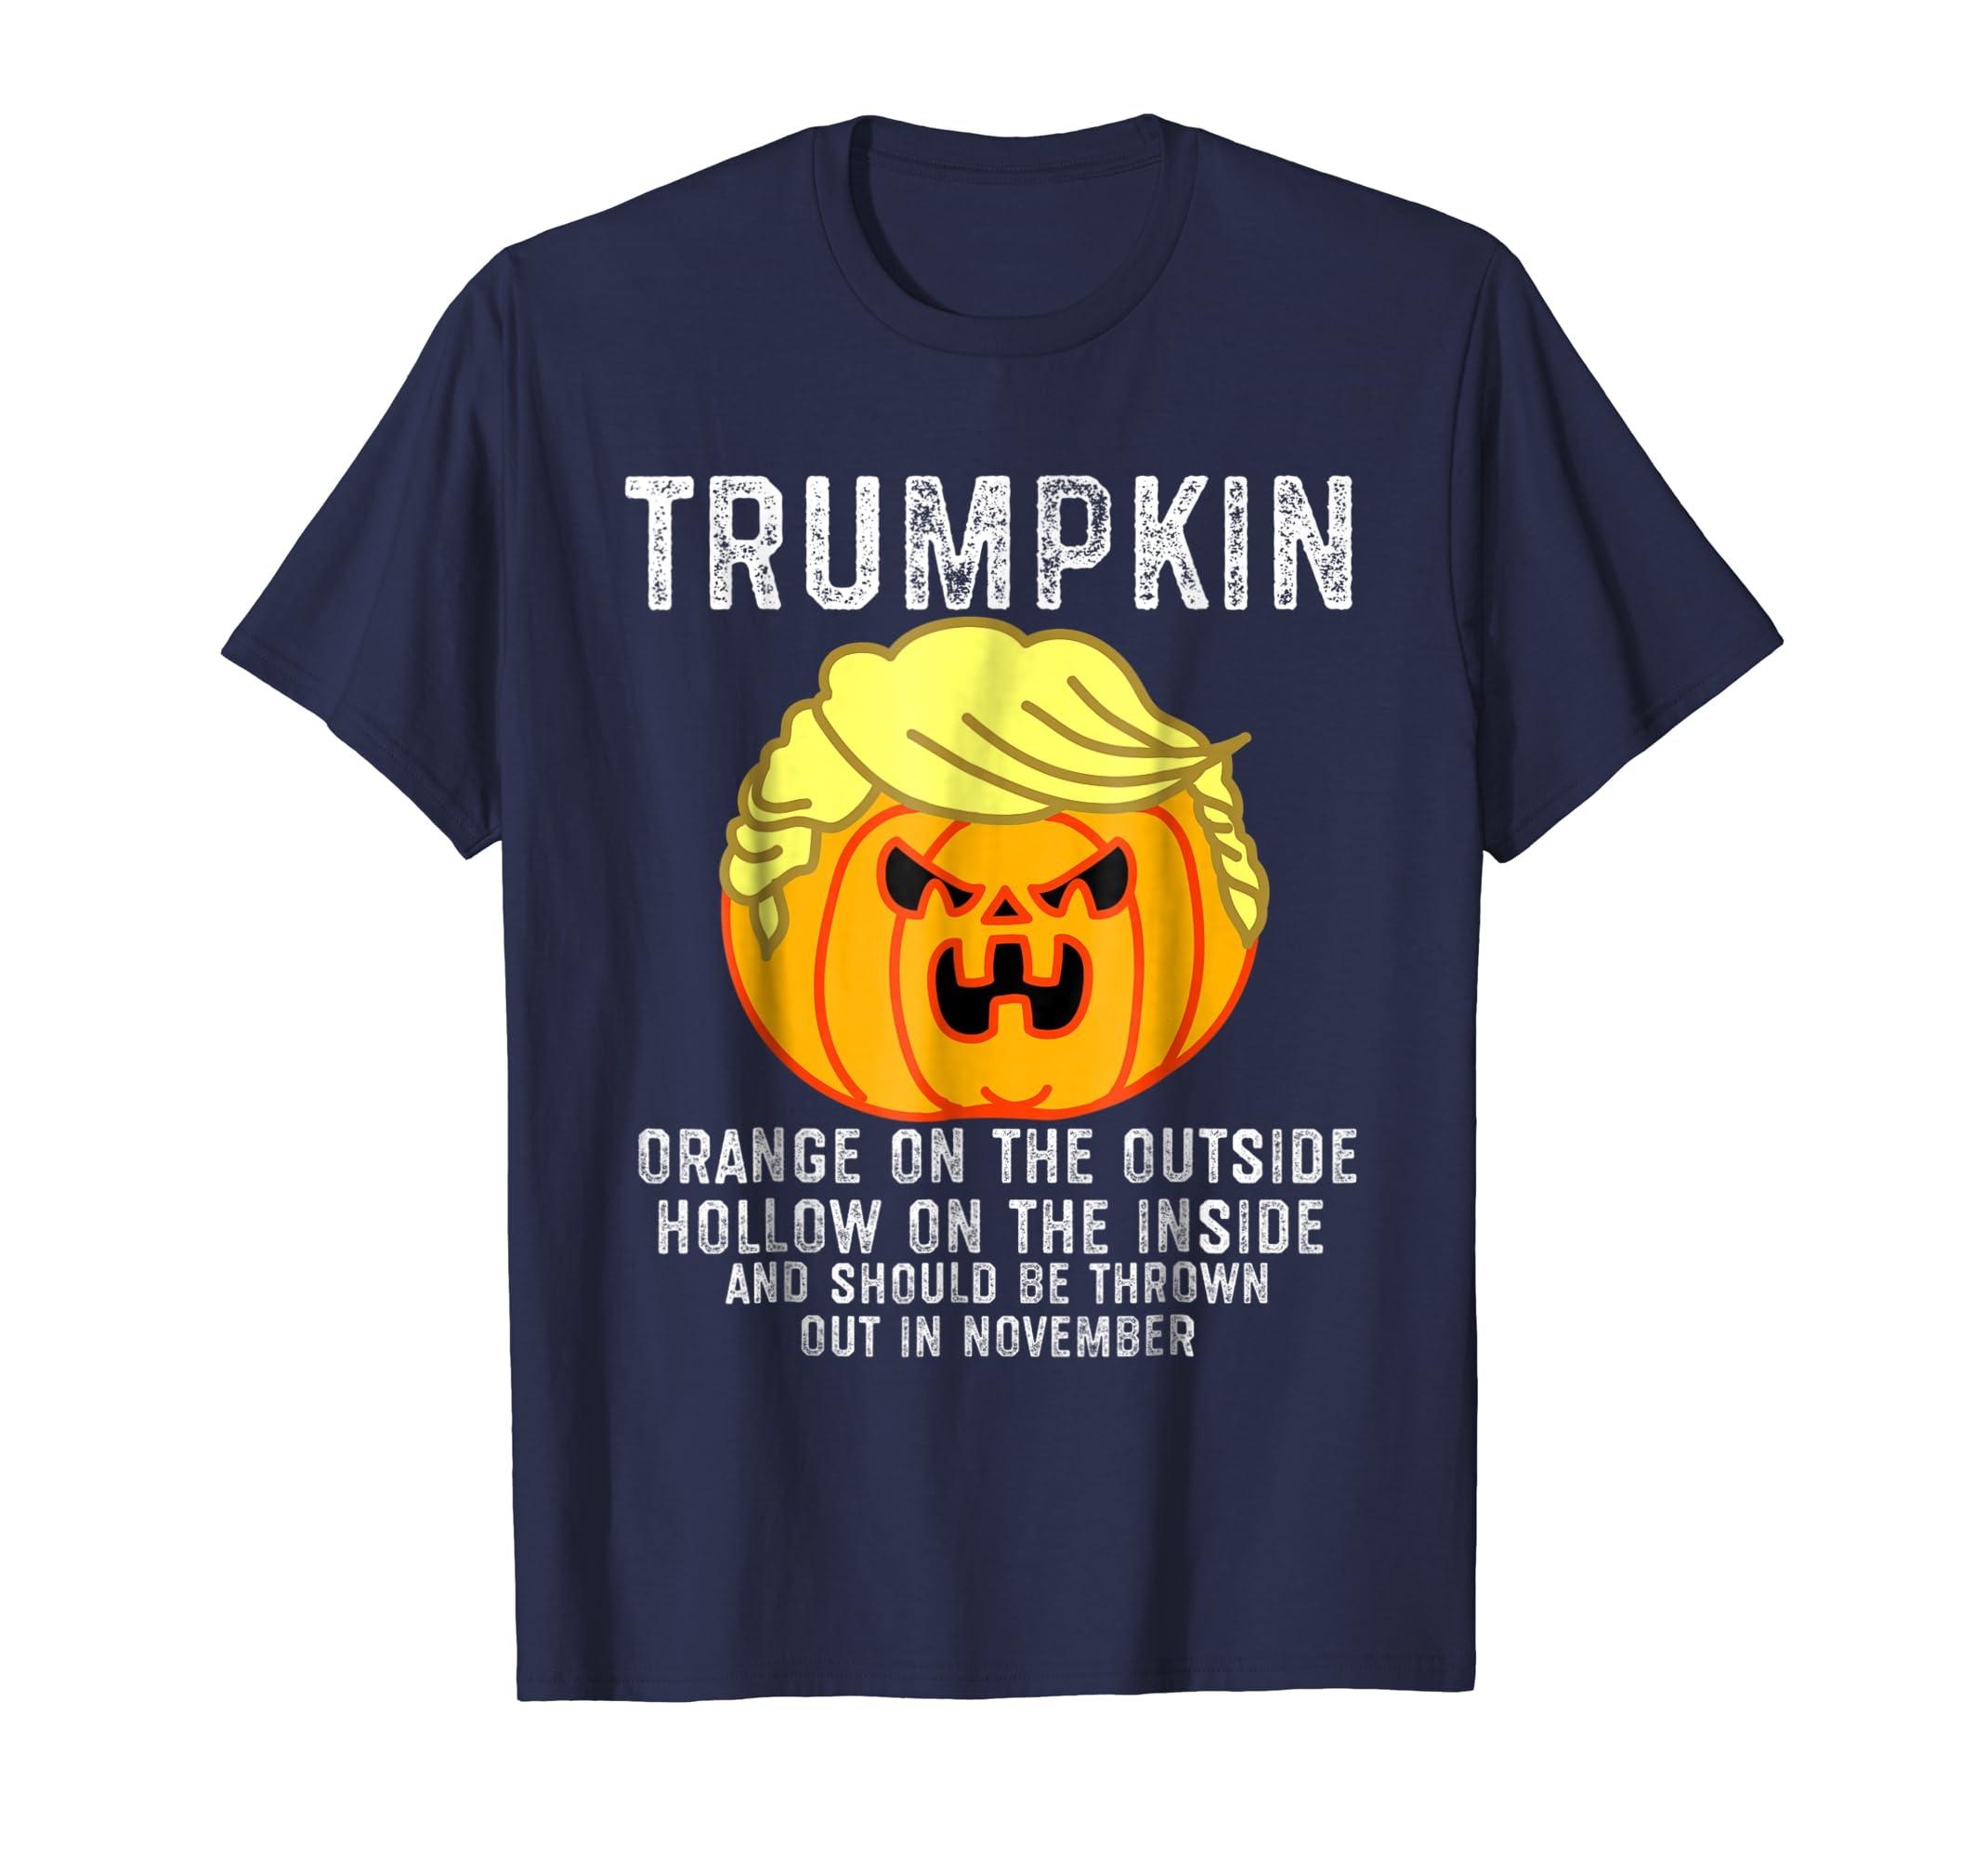 Trumpkin Shirt, Orange on the Outside Hollow on the Inside-Teechatpro